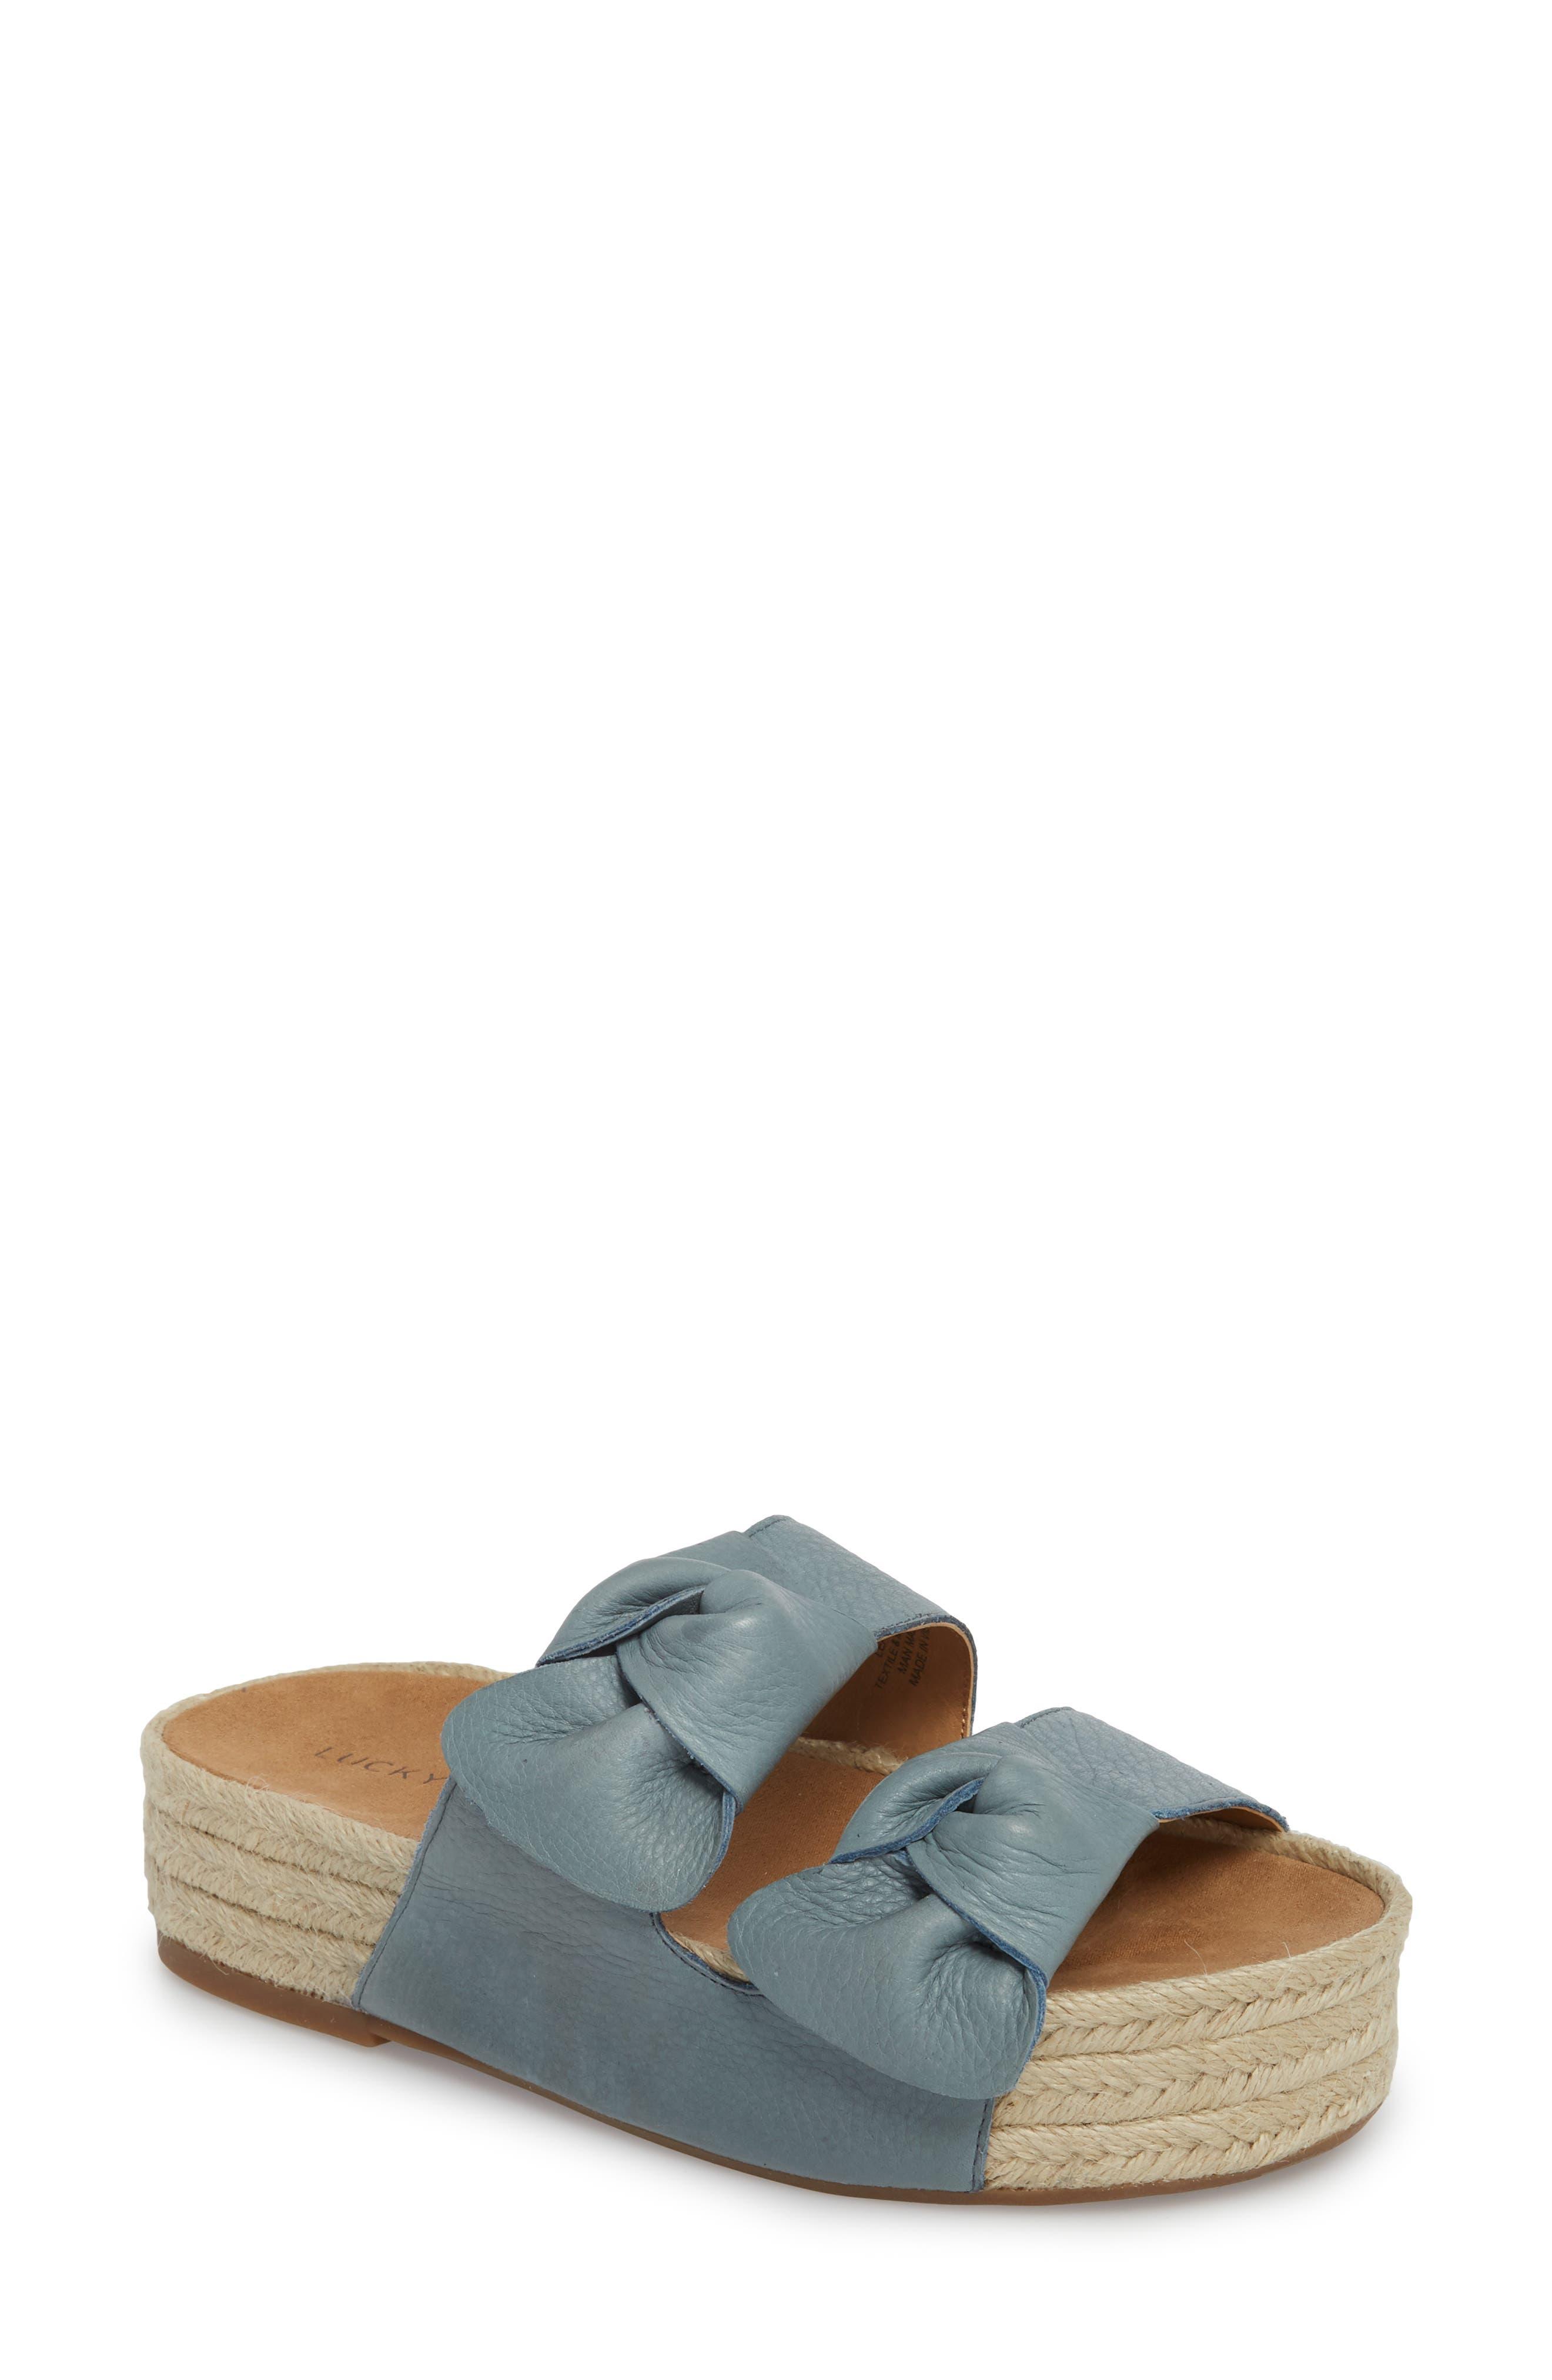 Izbremma Platform Espadrille Sandal,                             Main thumbnail 1, color,                             Infinity Leather